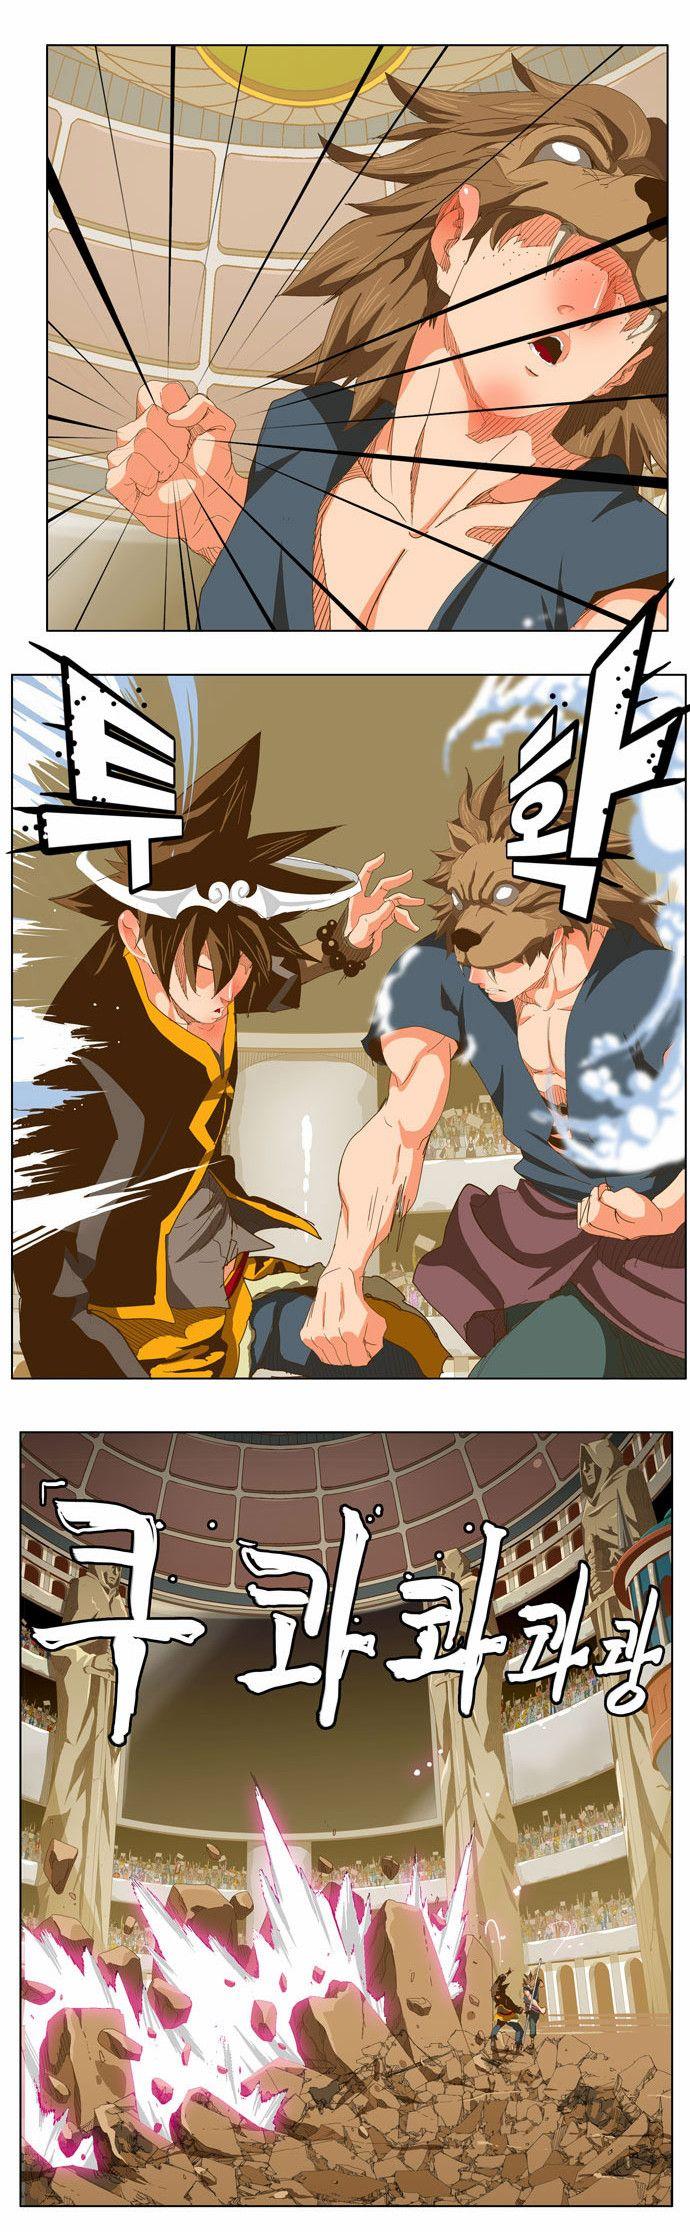 http://c5.ninemanga.com/es_manga/37/485/456884/bfecf8f10580b916be79cd1f98a95840.jpg Page 7